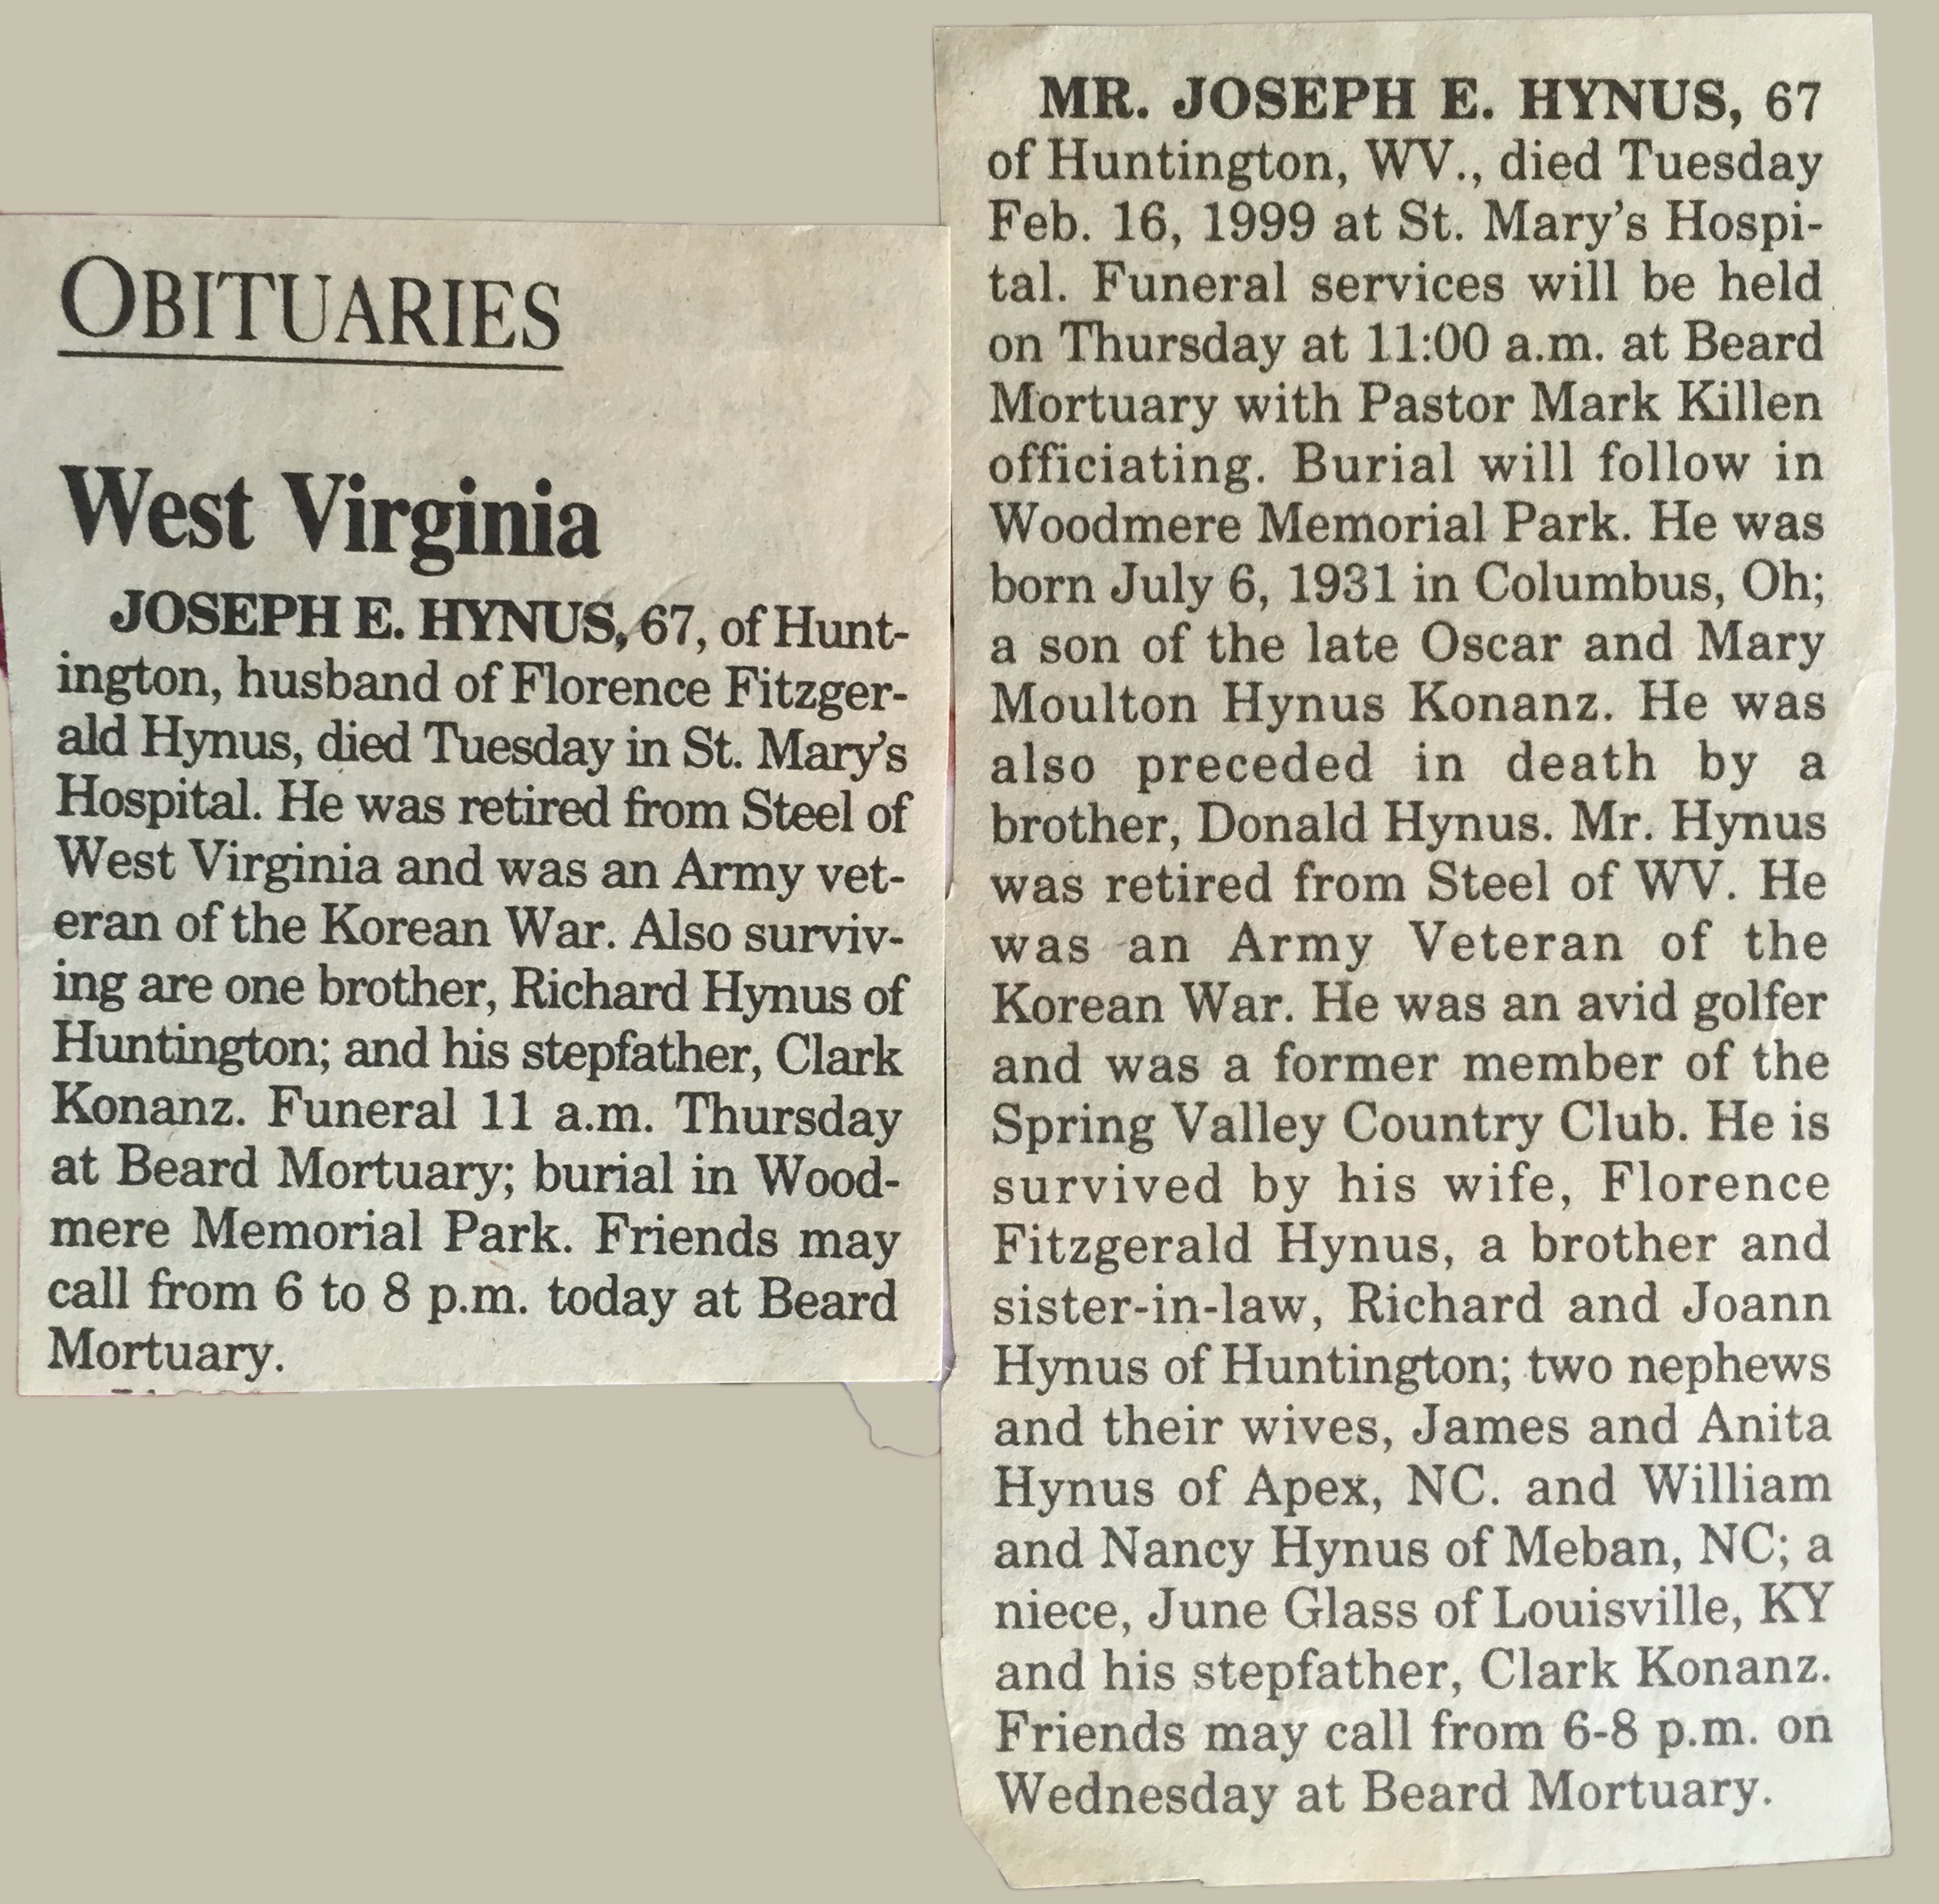 Joseph Hynus